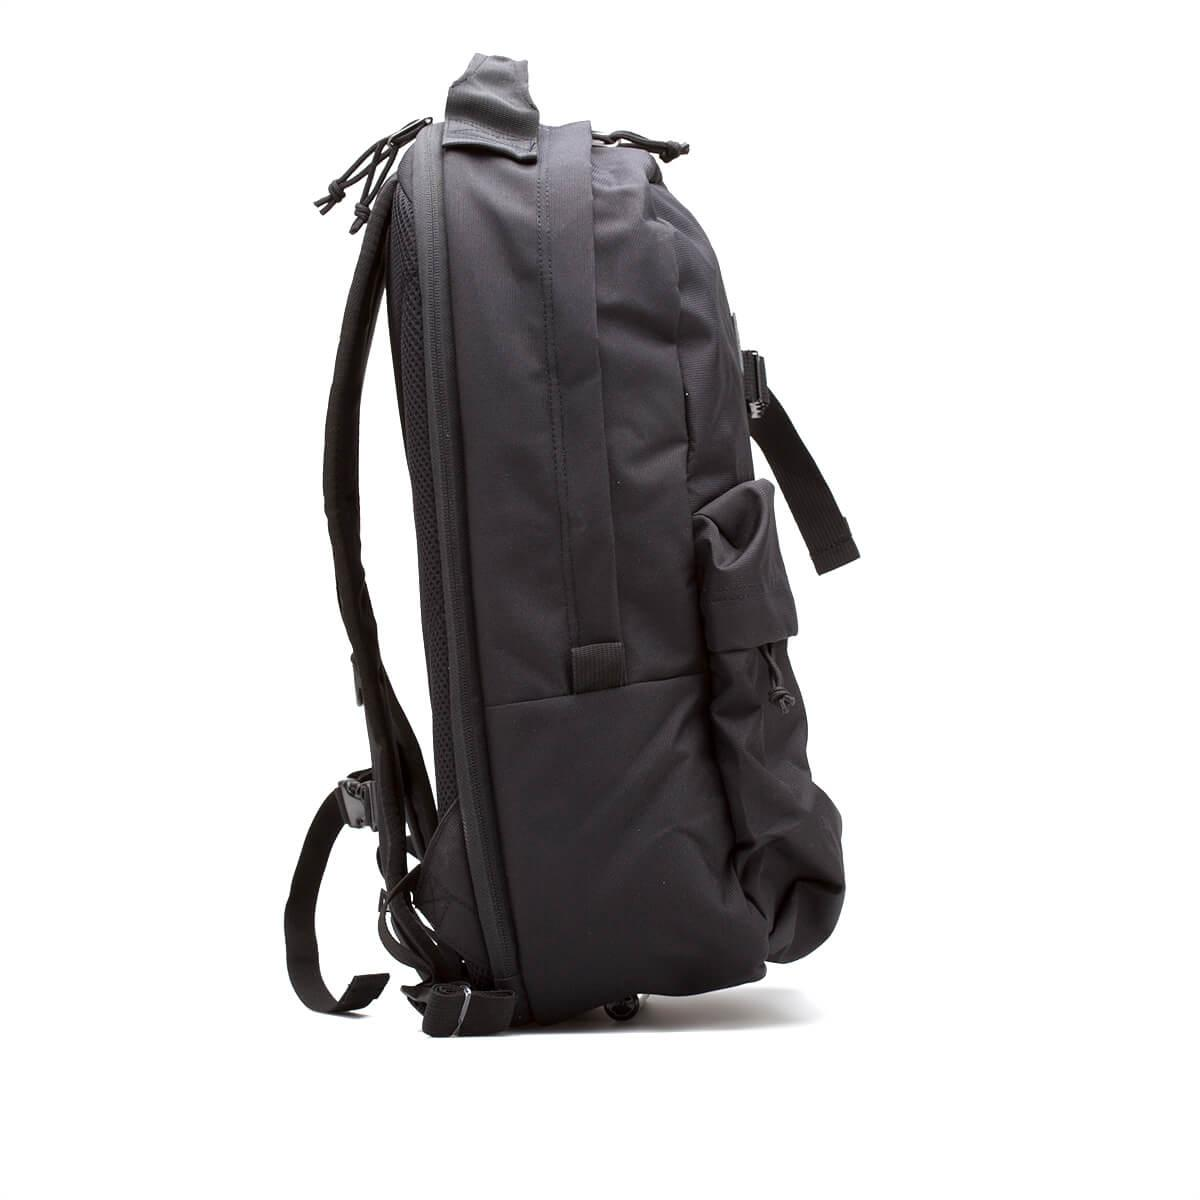 Lyst - Vans Old Skool Travel Backpack in Black for Men 1216cc639b